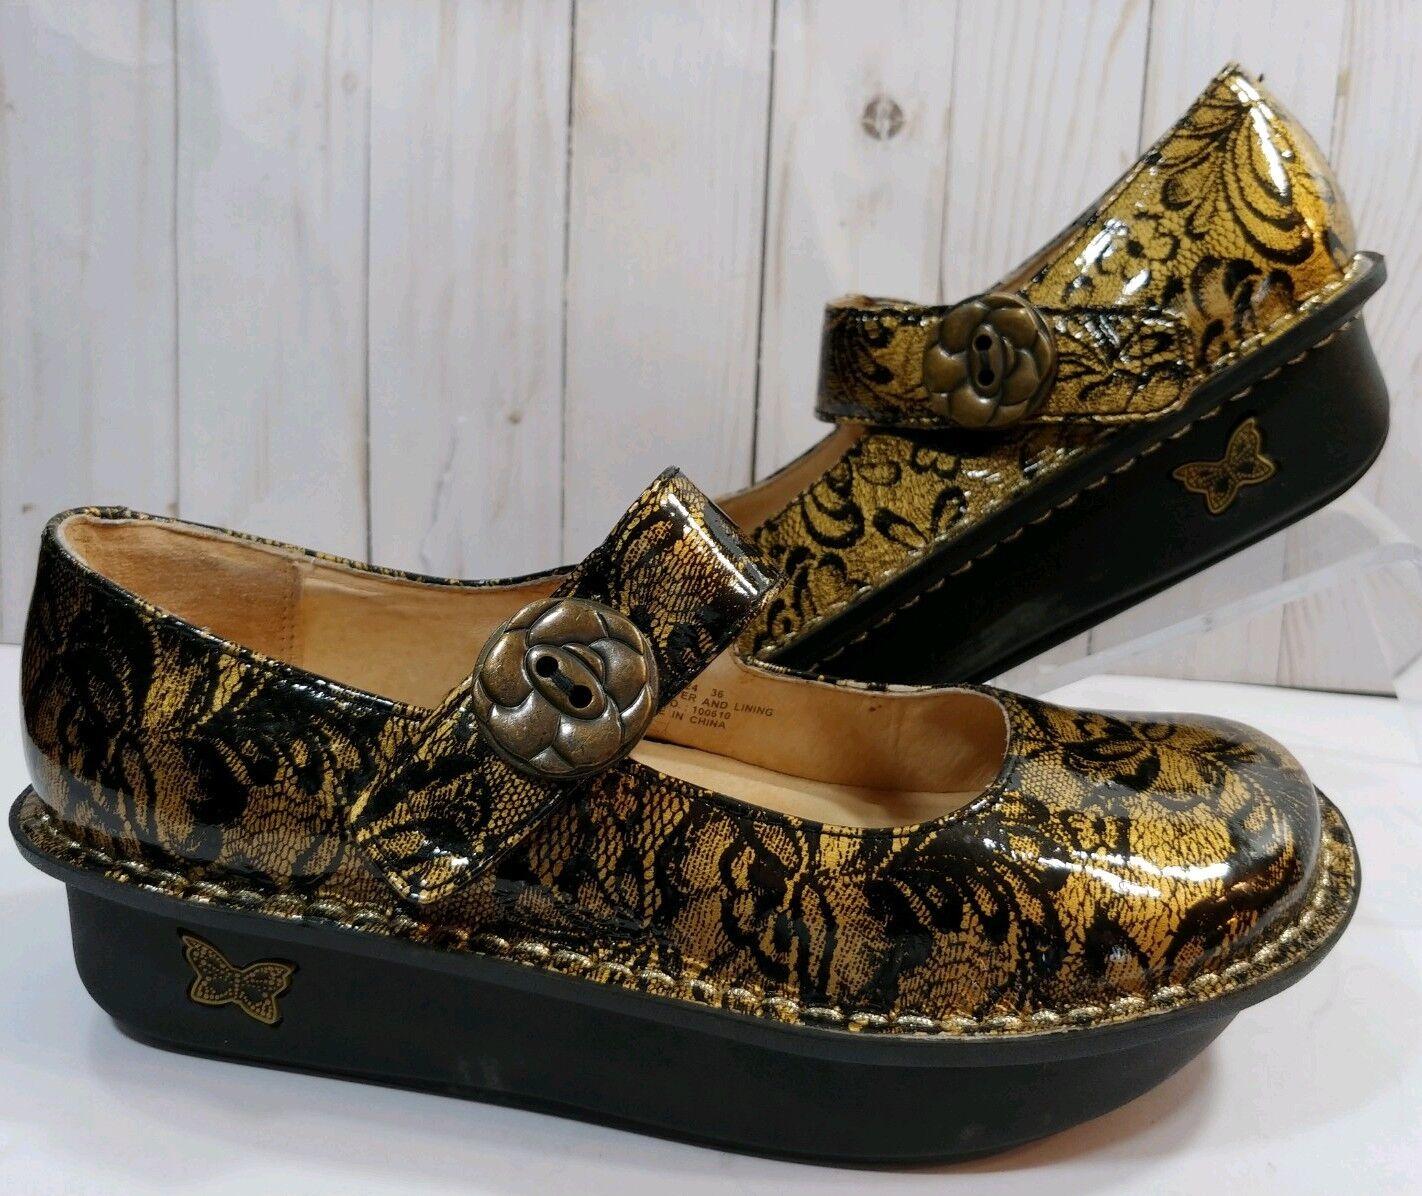 Alegria Paloma Or Dentelle noir Cuir Mary Jane chaussures Prof infirmière EU36 US 6-6.5